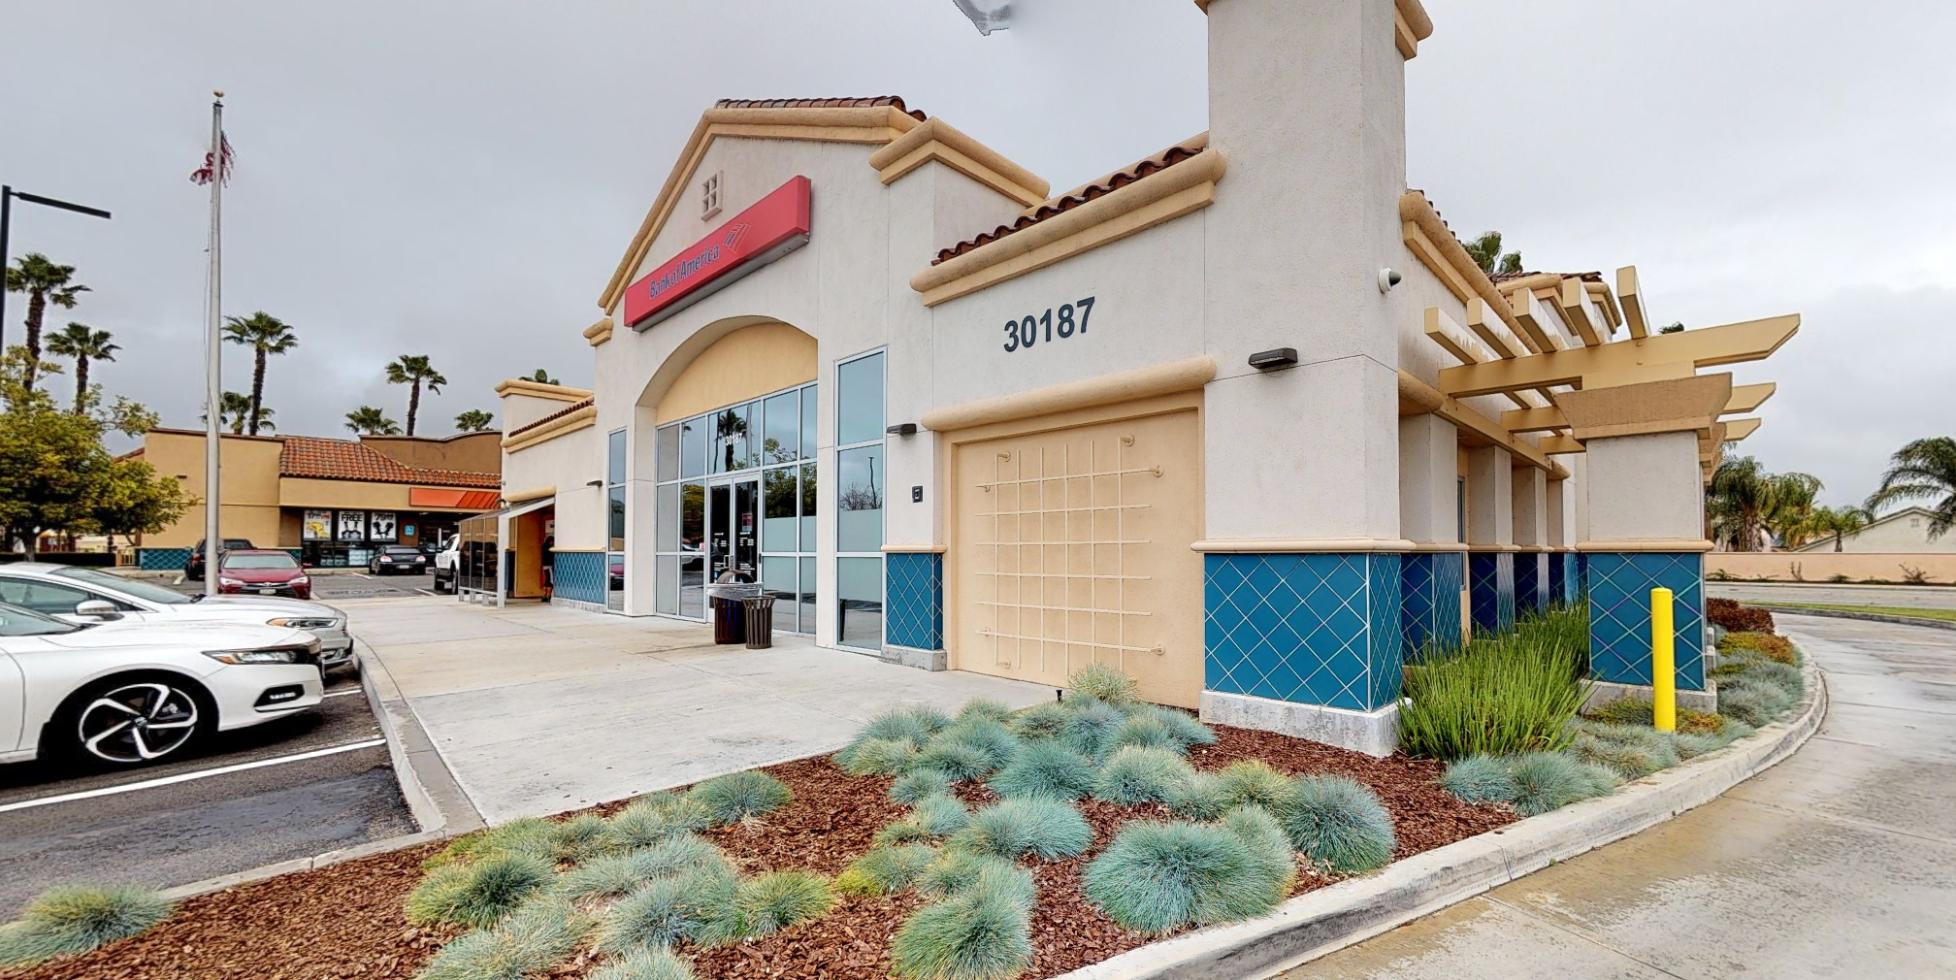 Bank of America financial center with drive-thru ATM | 30187 Antelope Rd, Menifee, CA 92584